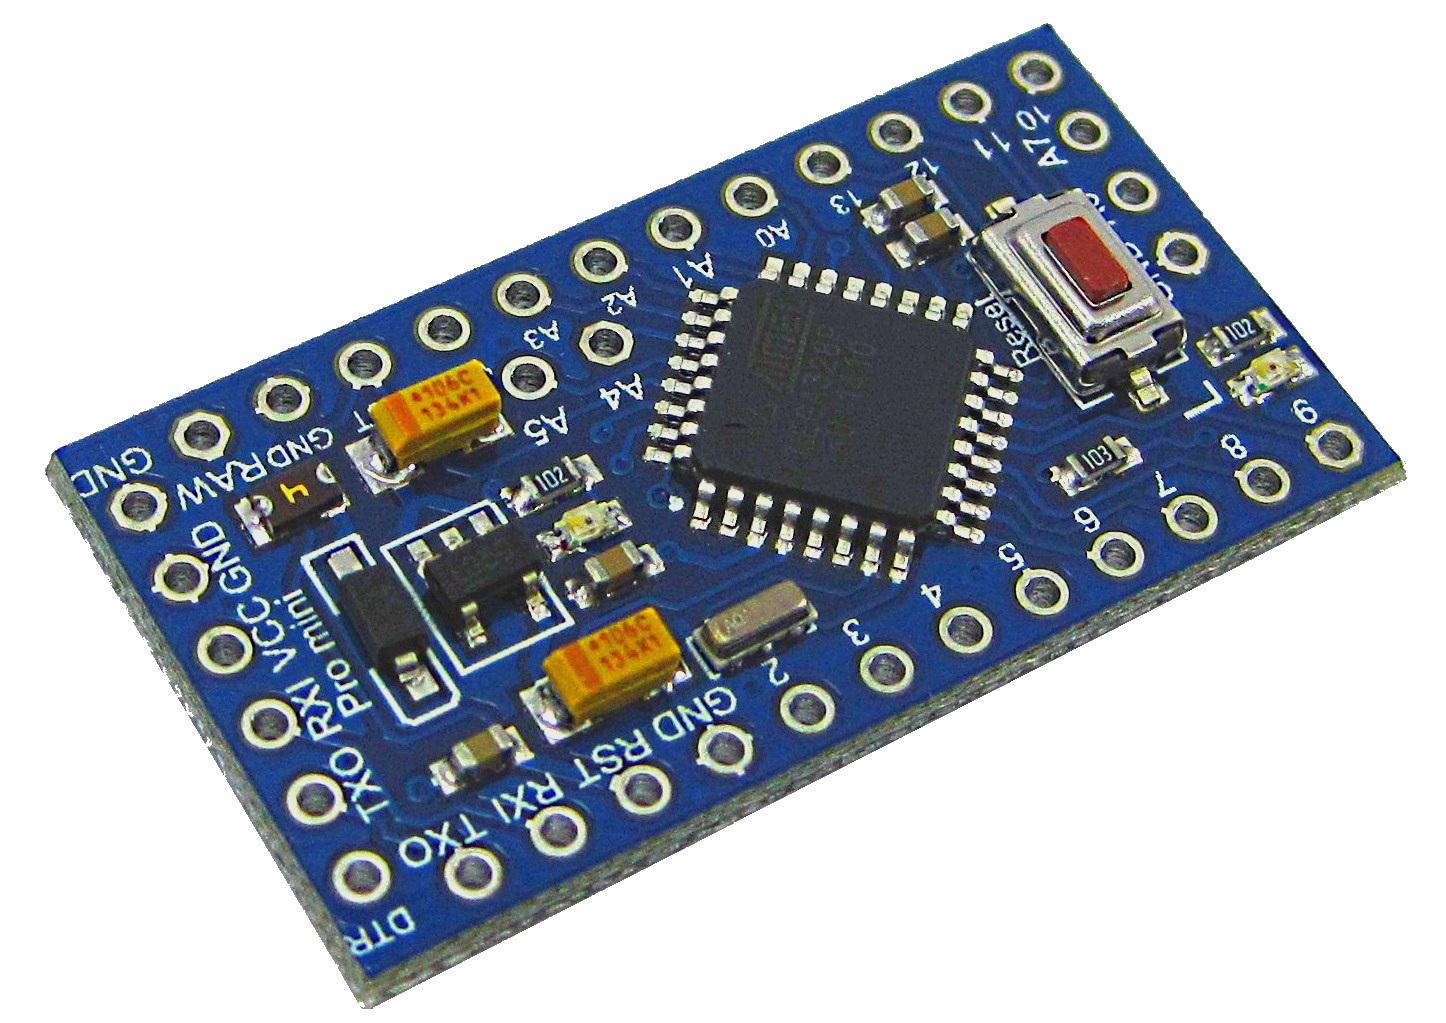 Emerging Technologies Arduino Boards Hall Effect Sensor Pic8051avr Usb Programmerdevelopment Pro Mini 328 Atmega328p Atmega328 5v 16mhz Compatible